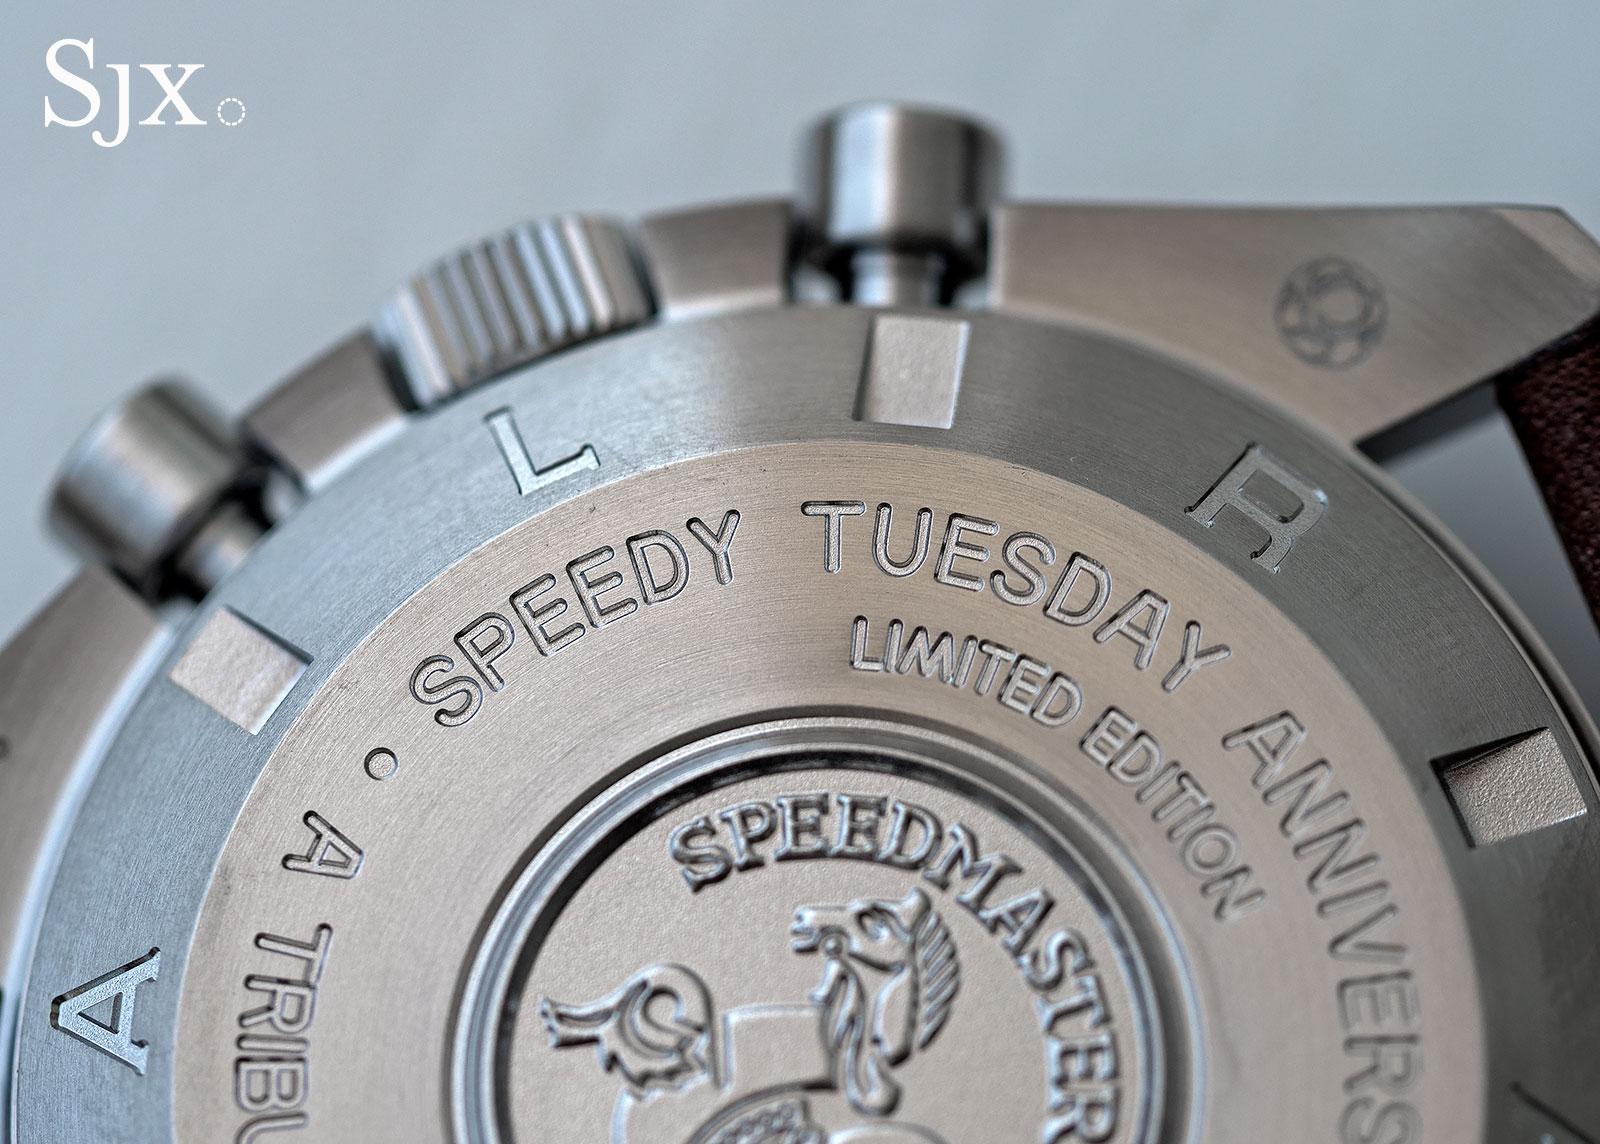 Omega Speedmaster Speedy Tuesday review 9